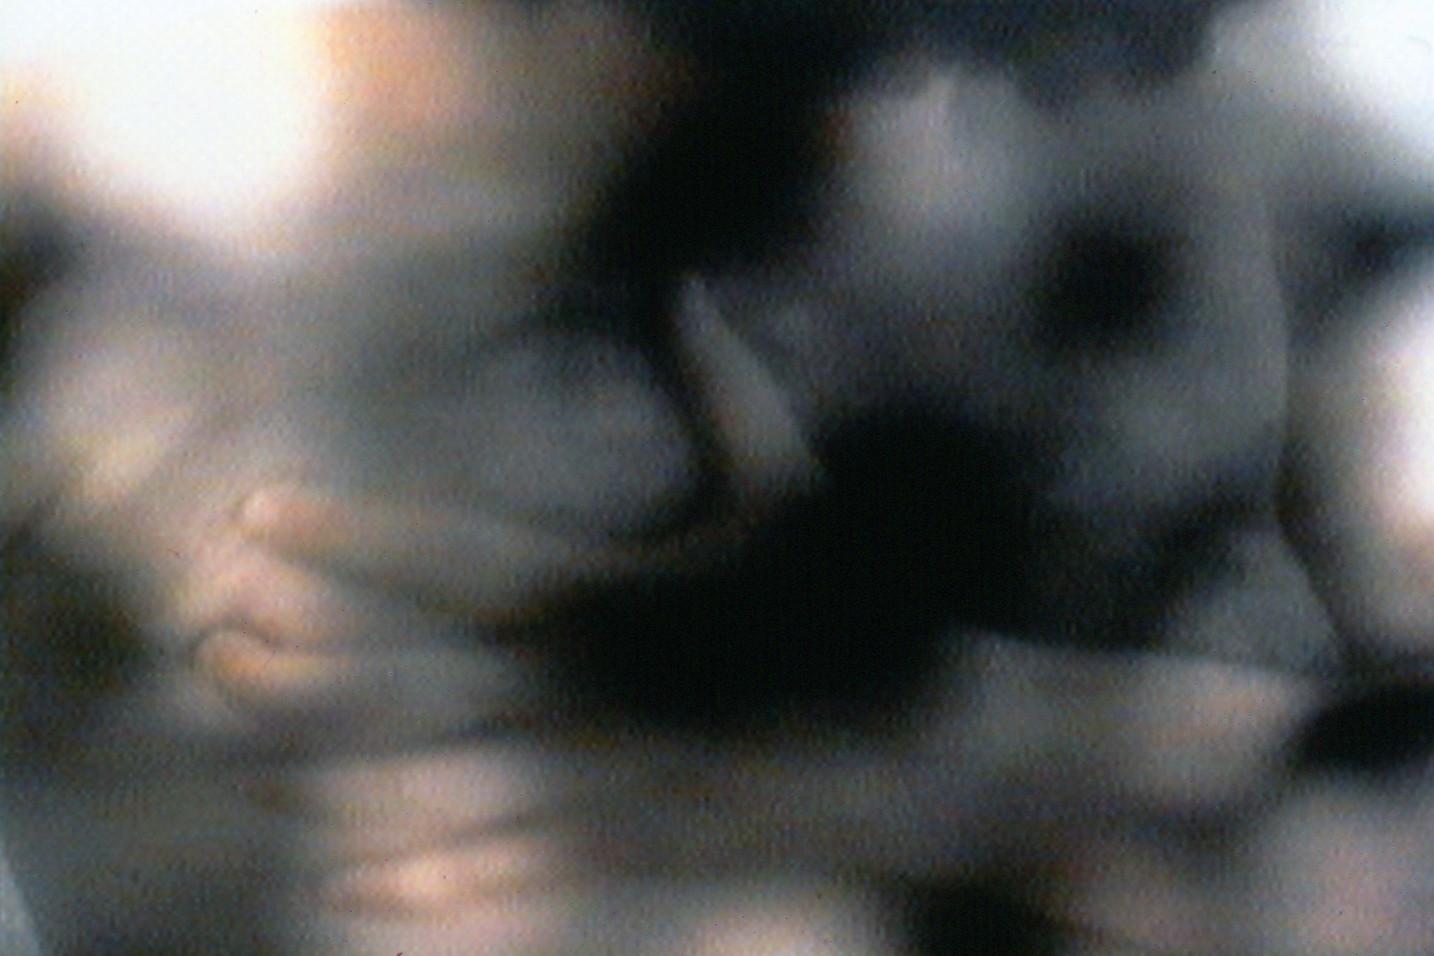 Simulate 1994-95